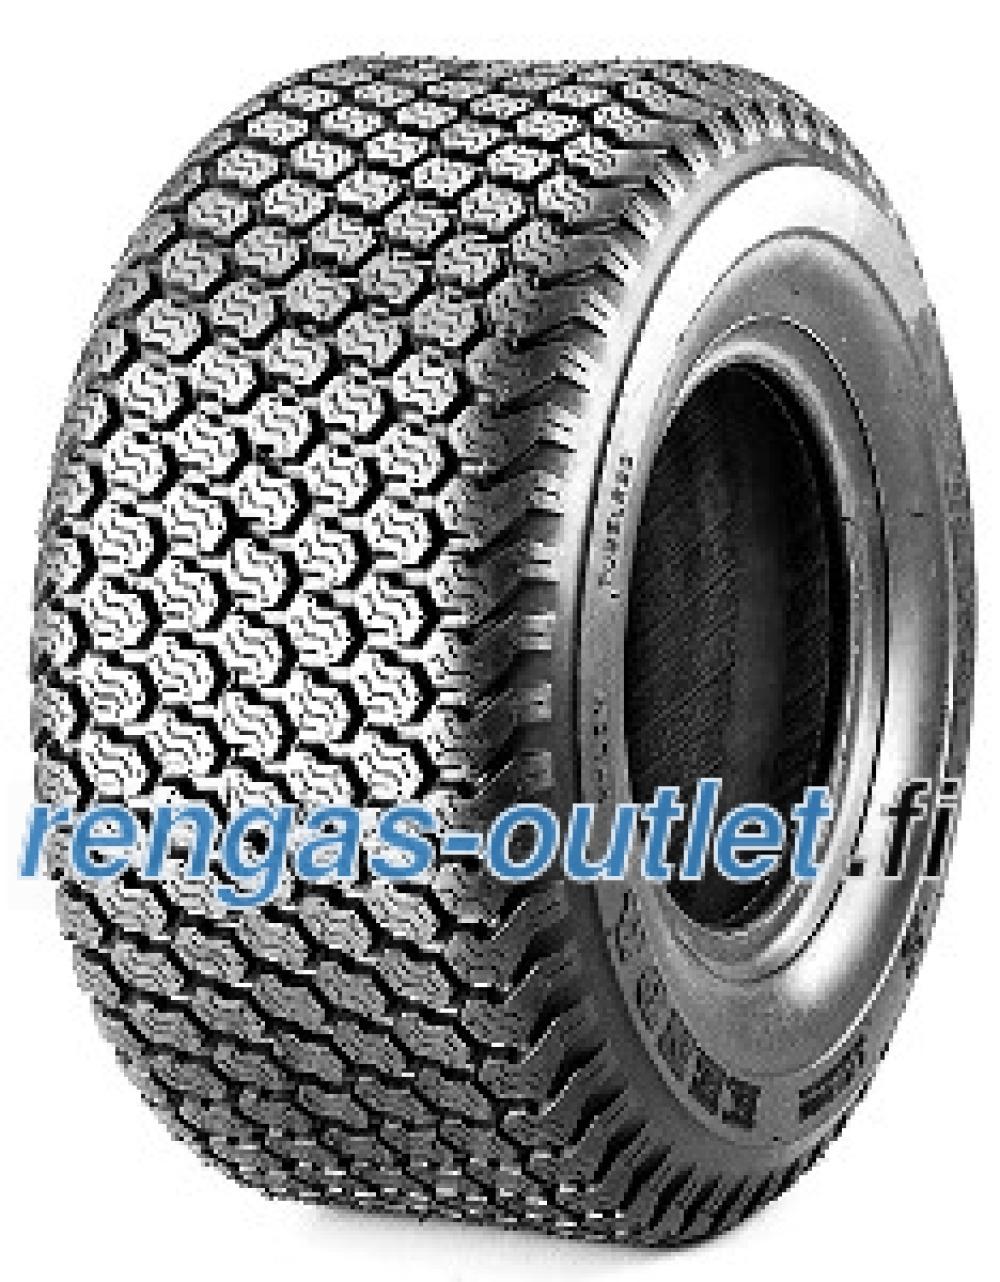 Kenda K500 Super Turf ( 23x9.50 -12 4PR TL NHS )